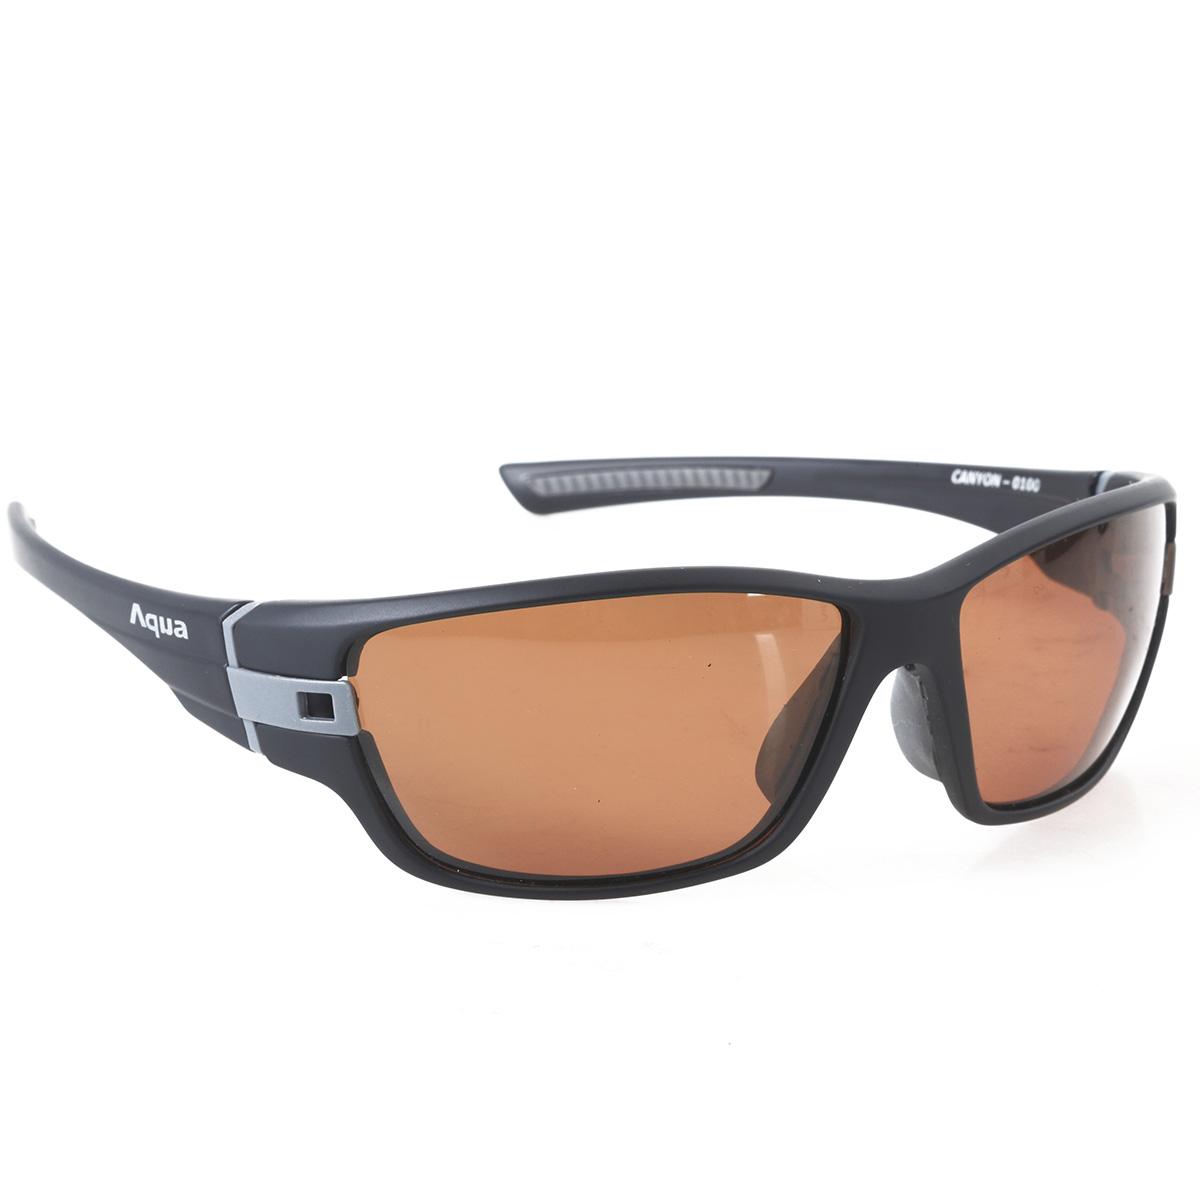 Aqua canyon black matt b fishing polarized sunglasses for Best fishing sunglasses under 50